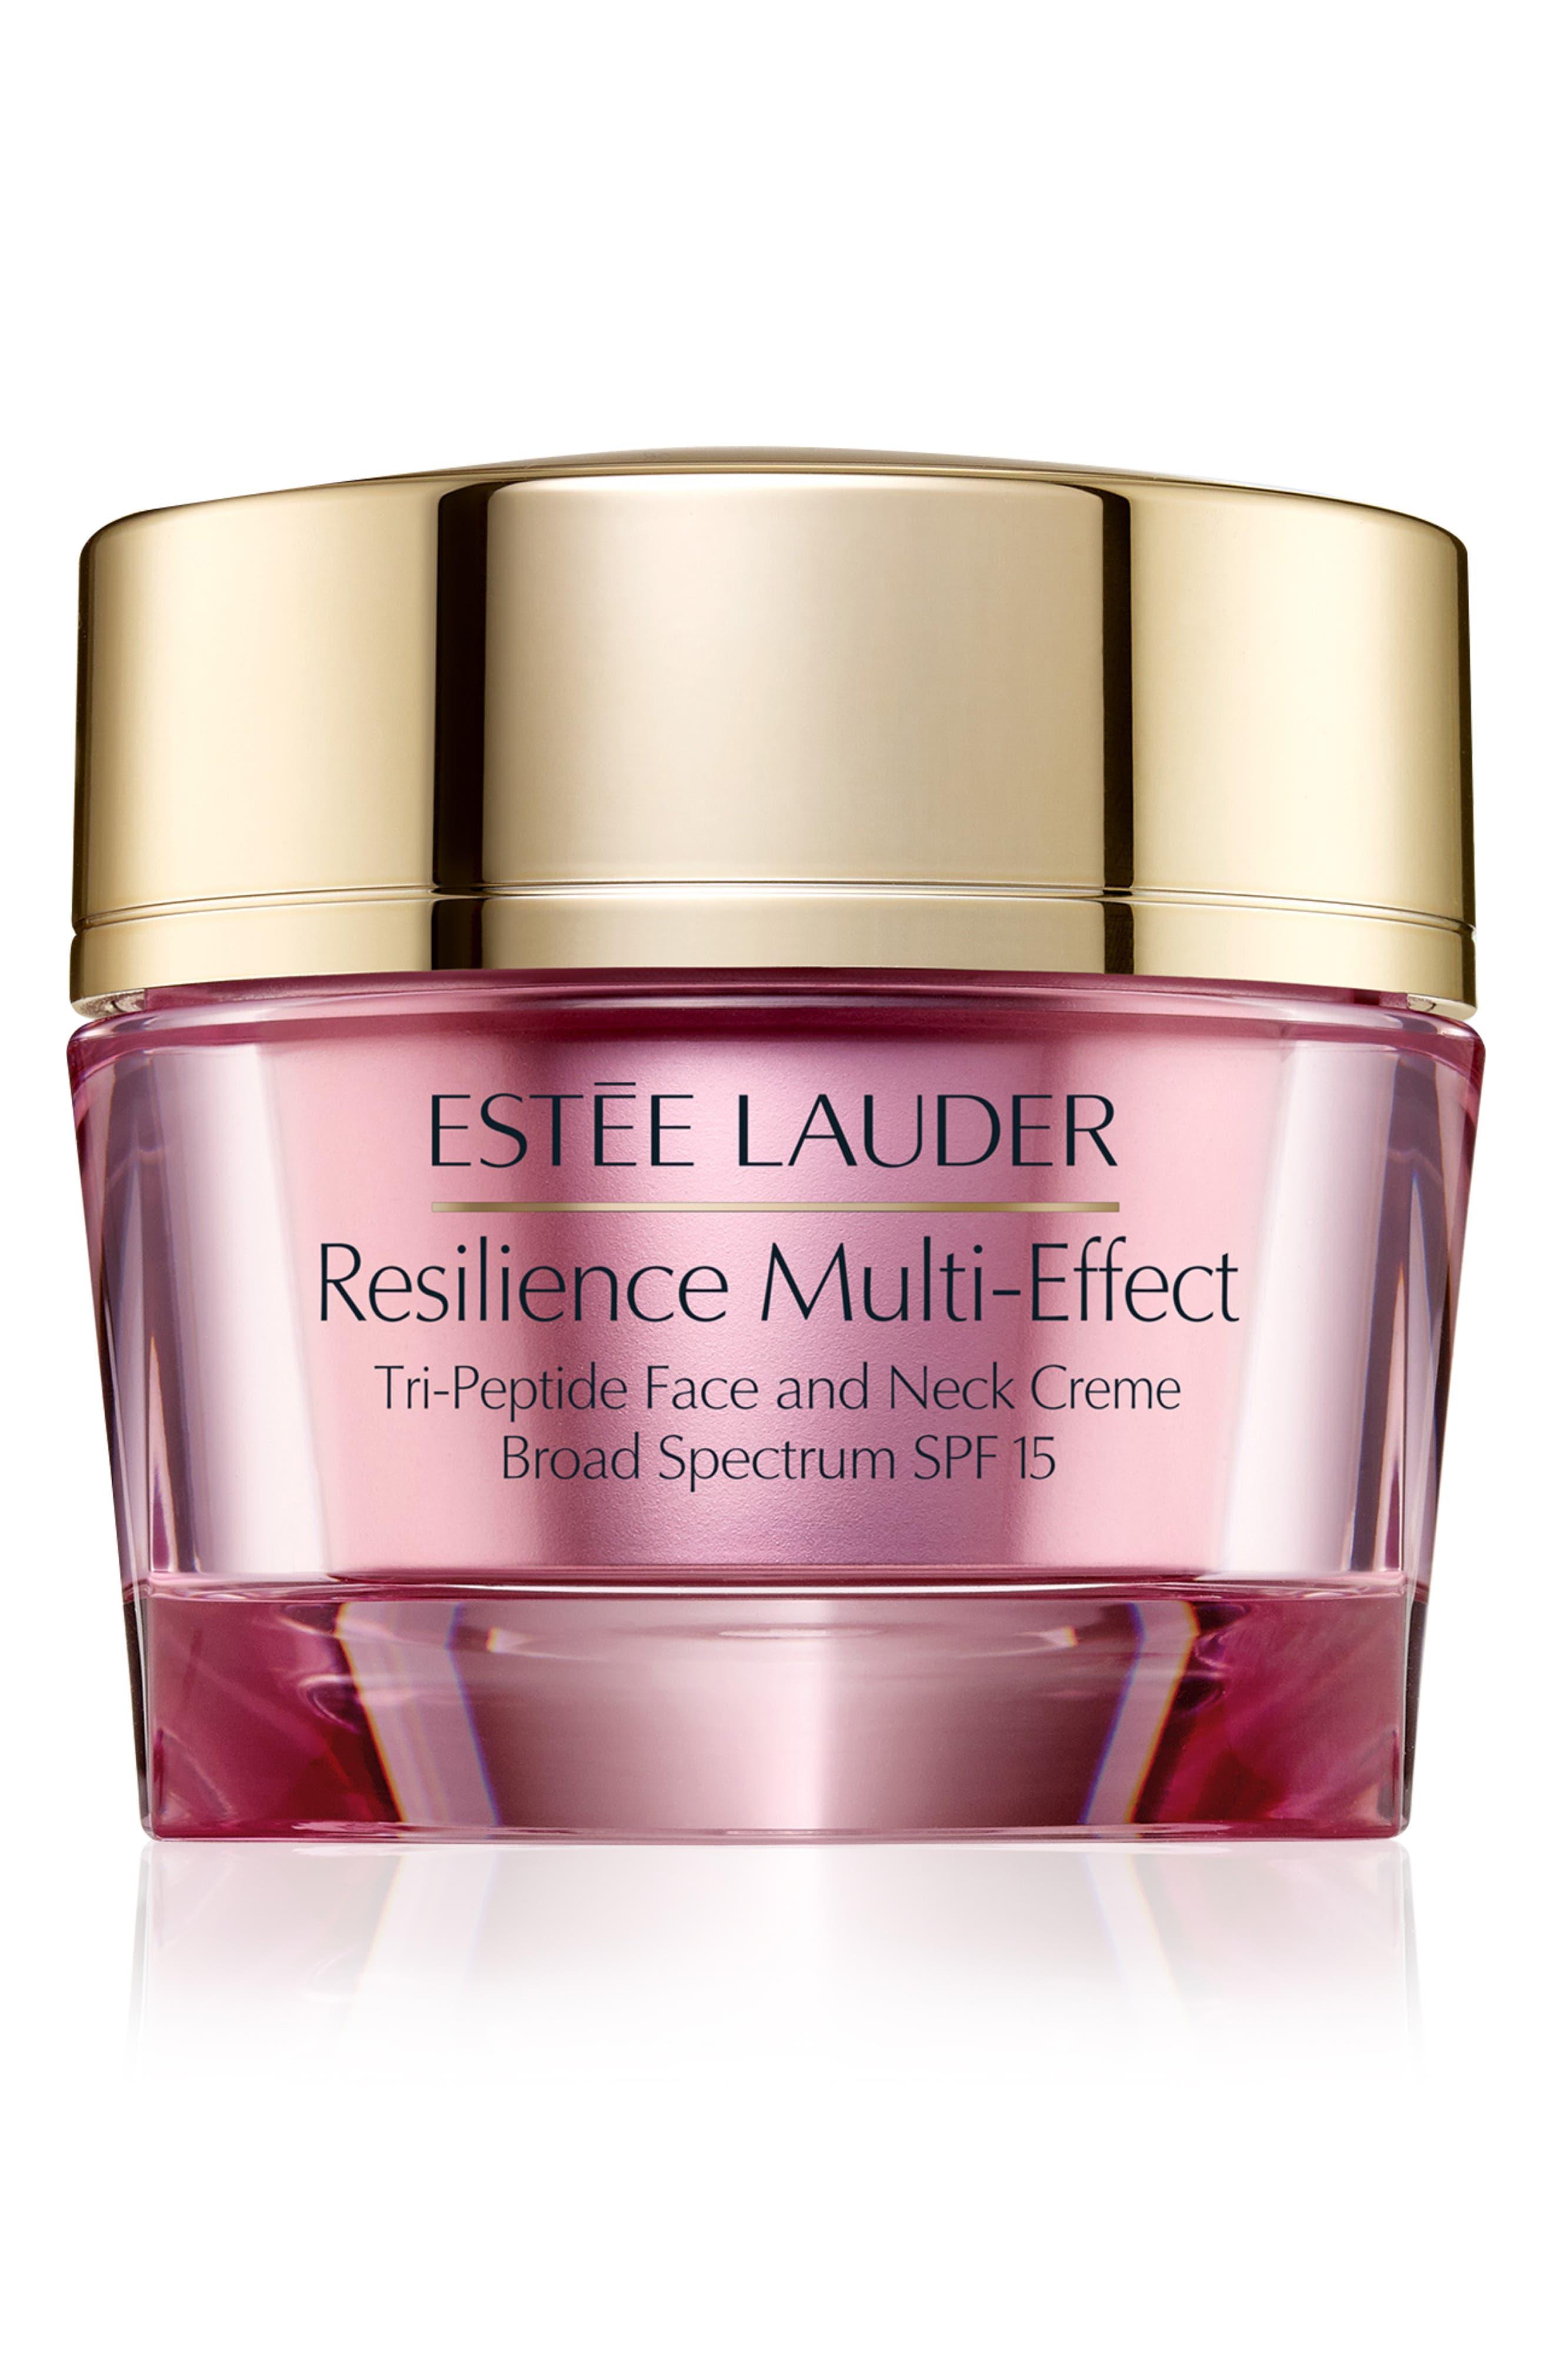 ESTÉE LAUDER Resilience Multi-Effect Tri-Peptide Face and Neck Creme SPF 15 for Normal/Combination Skin, Main, color, NO COLOR